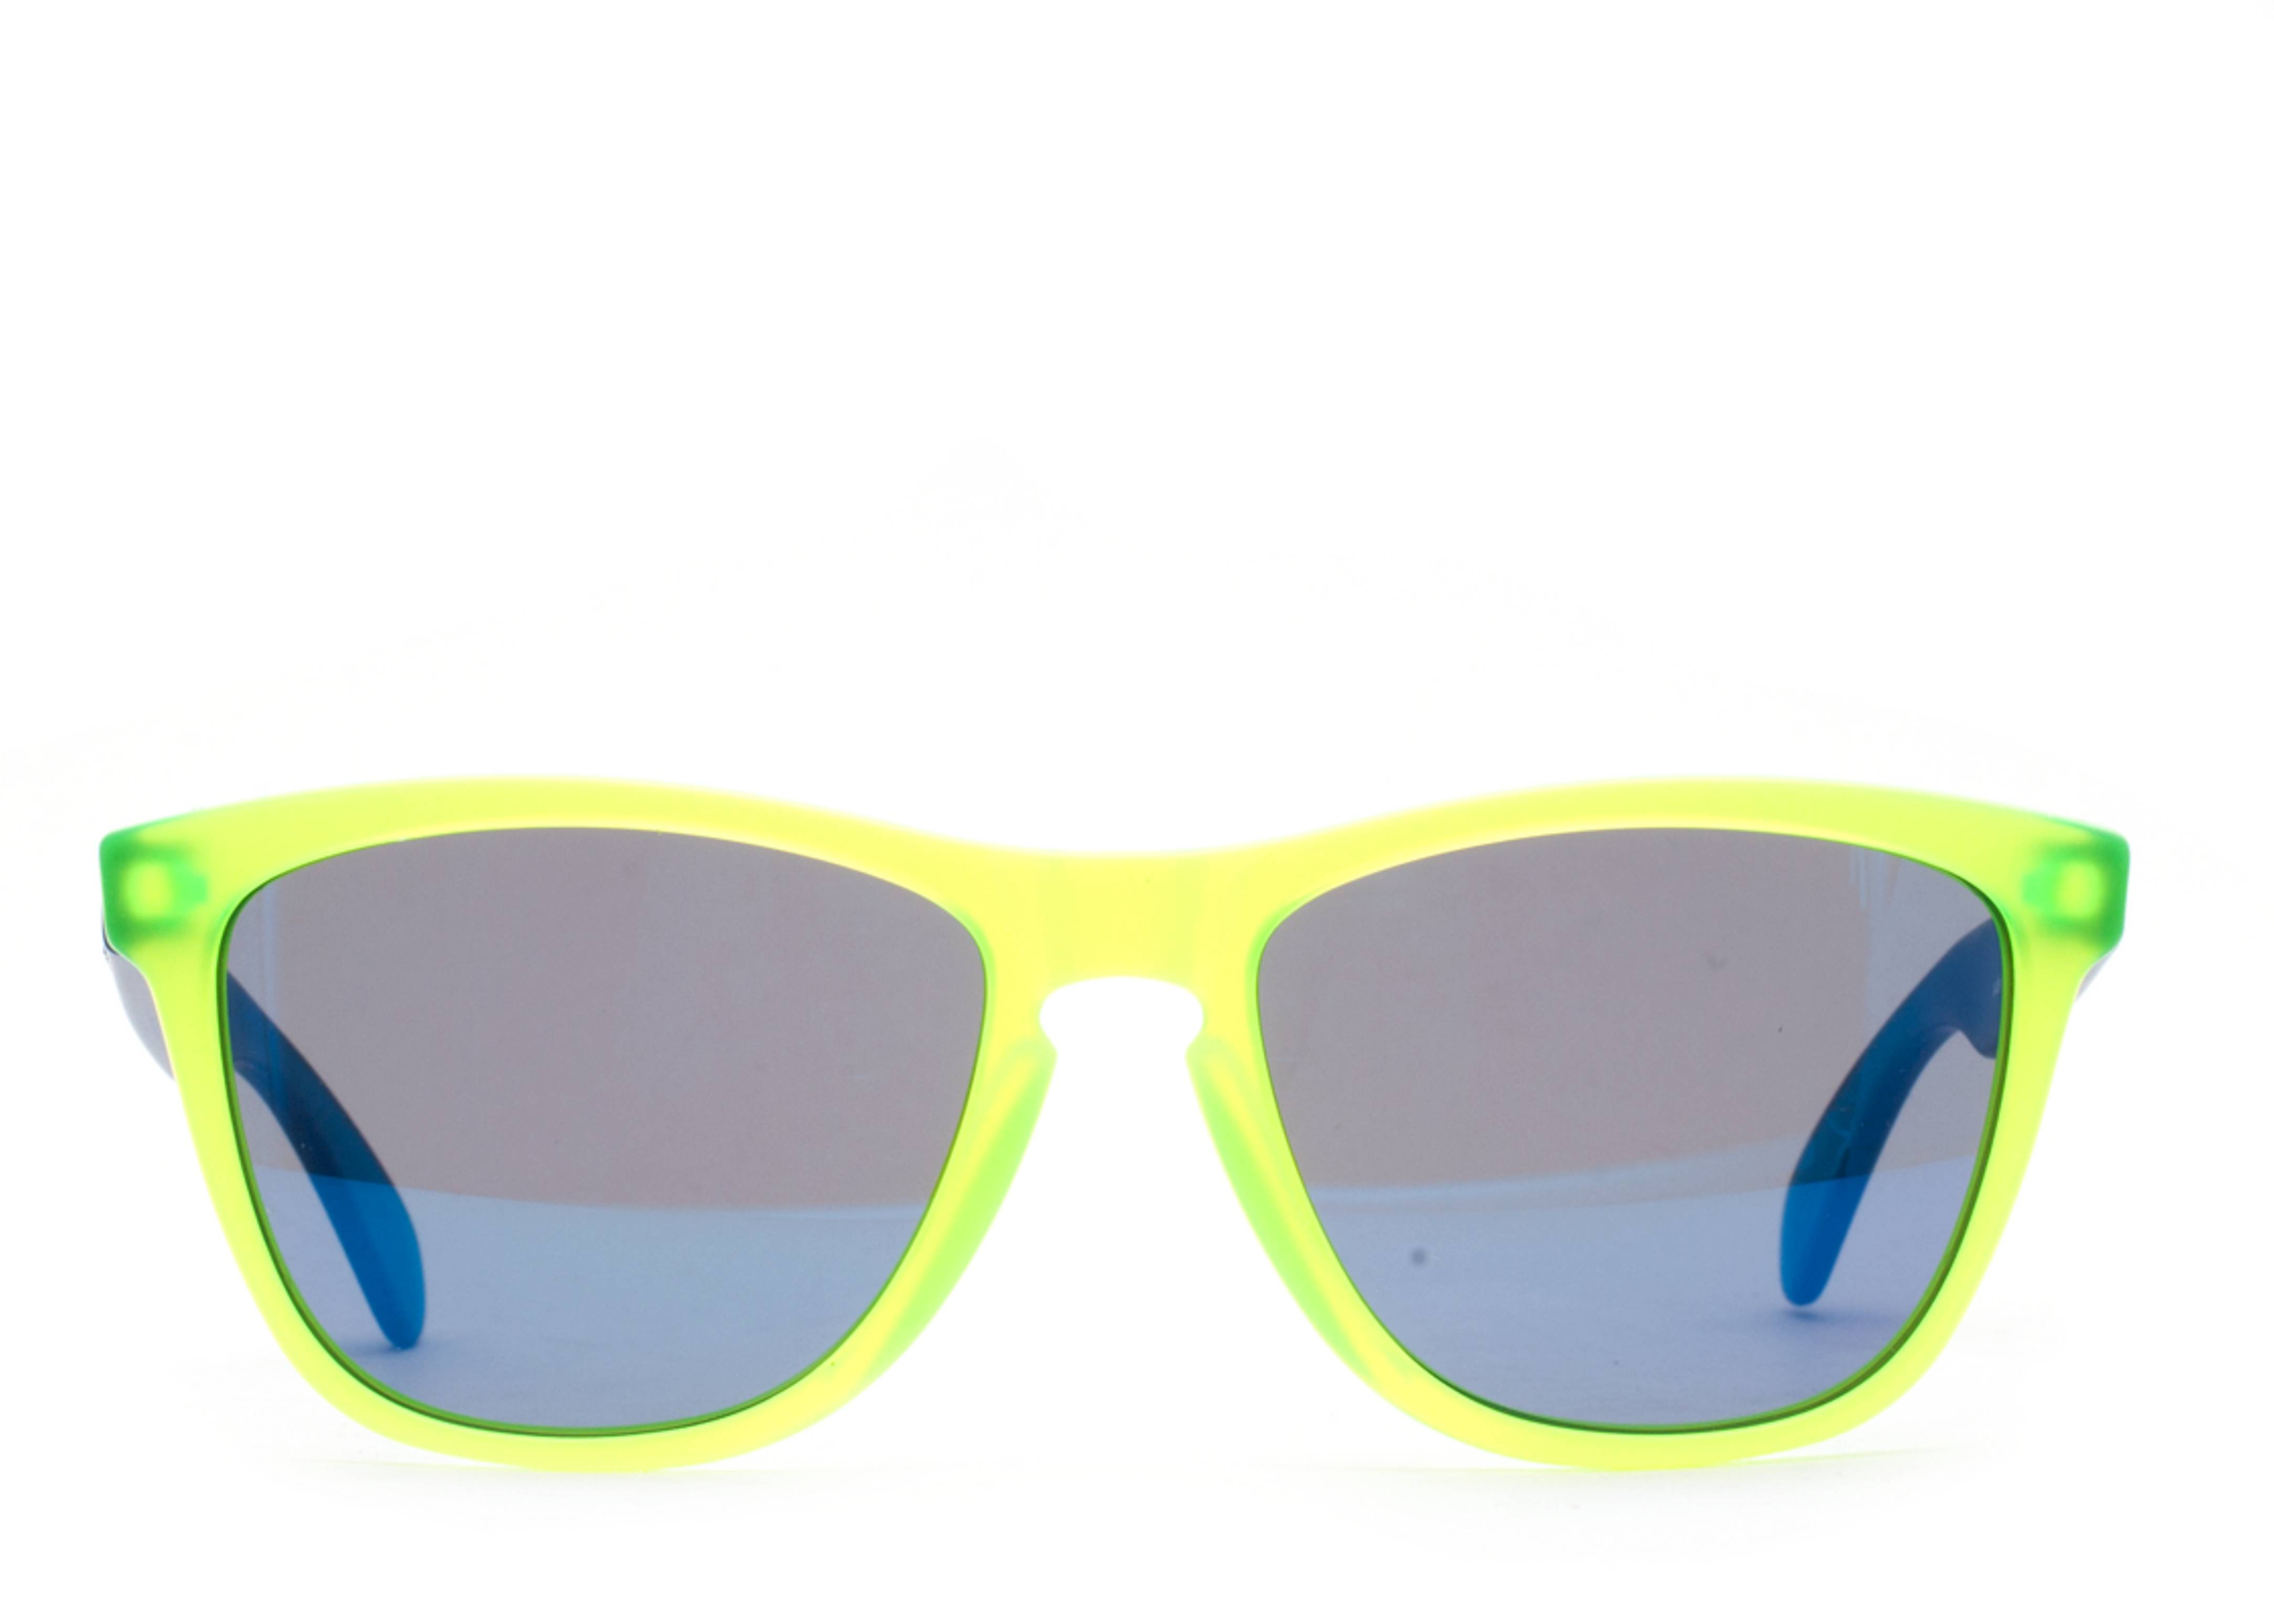 bf9ca6047c Oakley Frogskins Blue Yellow « Heritage Malta